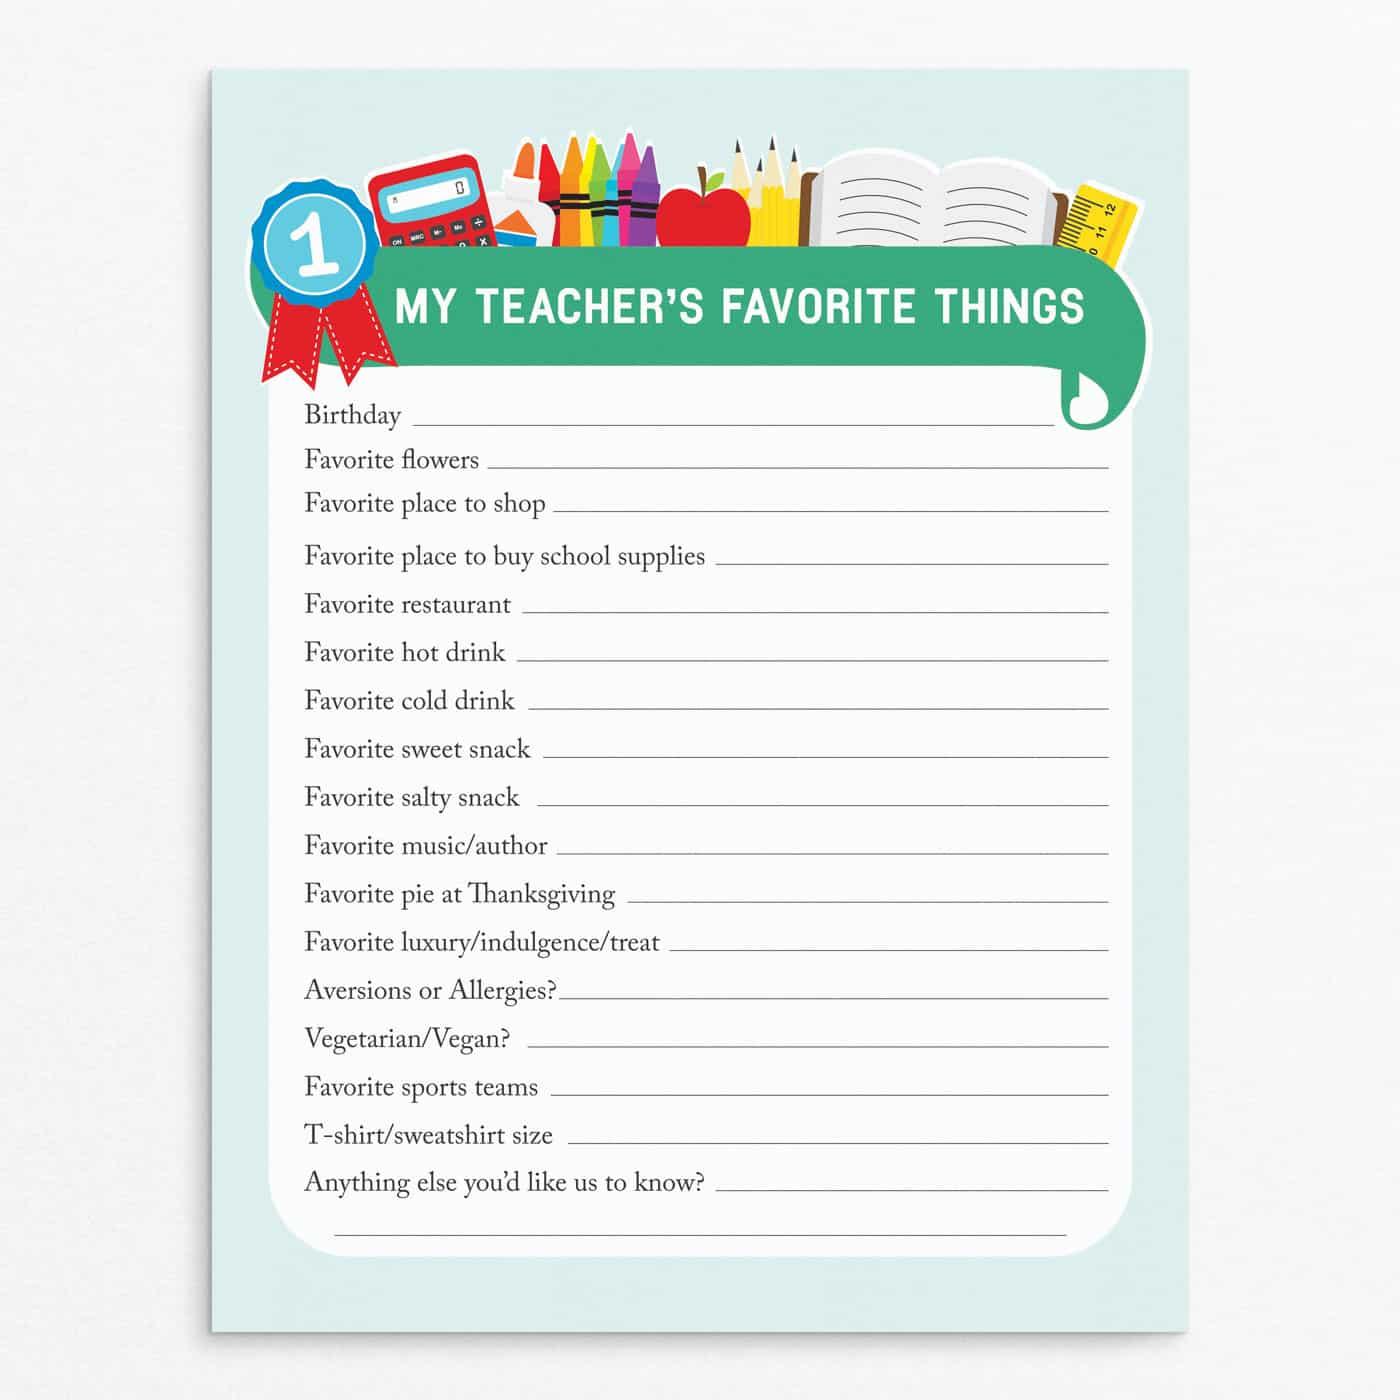 Teacher favorite things questionnaire for easy teacher gift ideas.